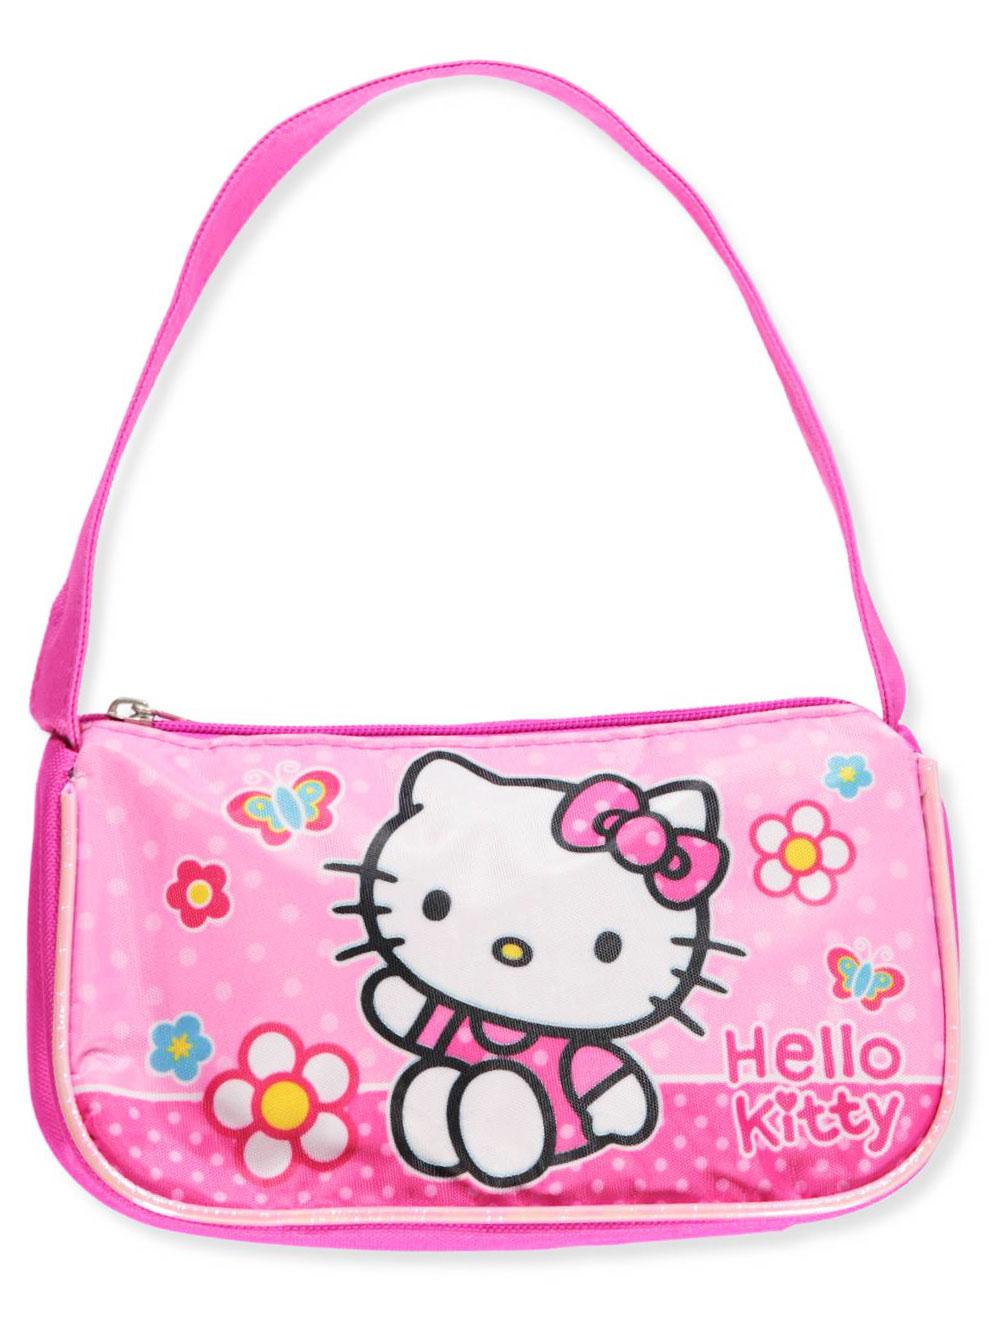 c6cb082aa408 Hello Kitty Shoulder Purse